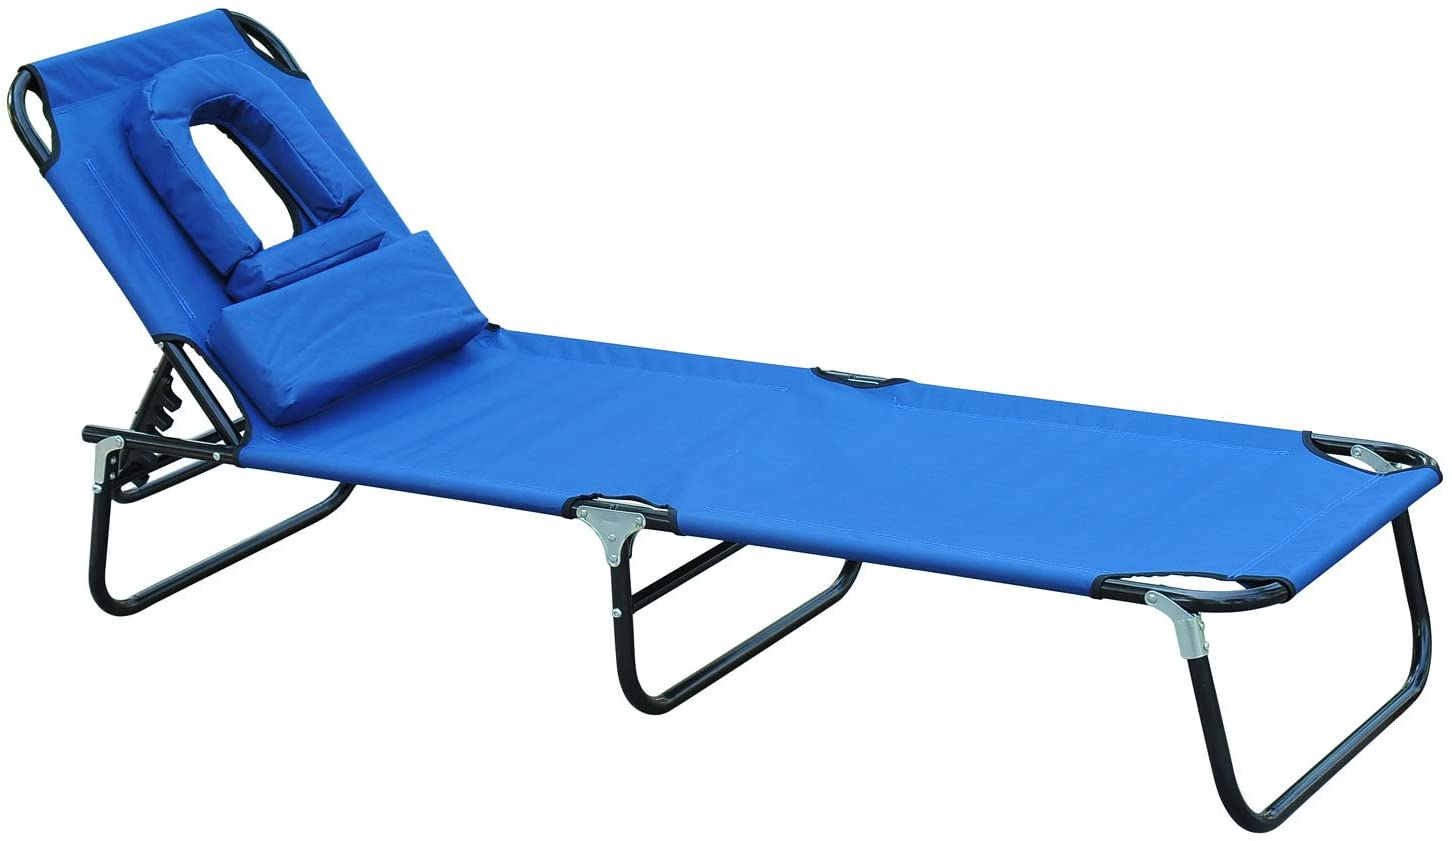 Outsunny Tumbona reclinable y plegable